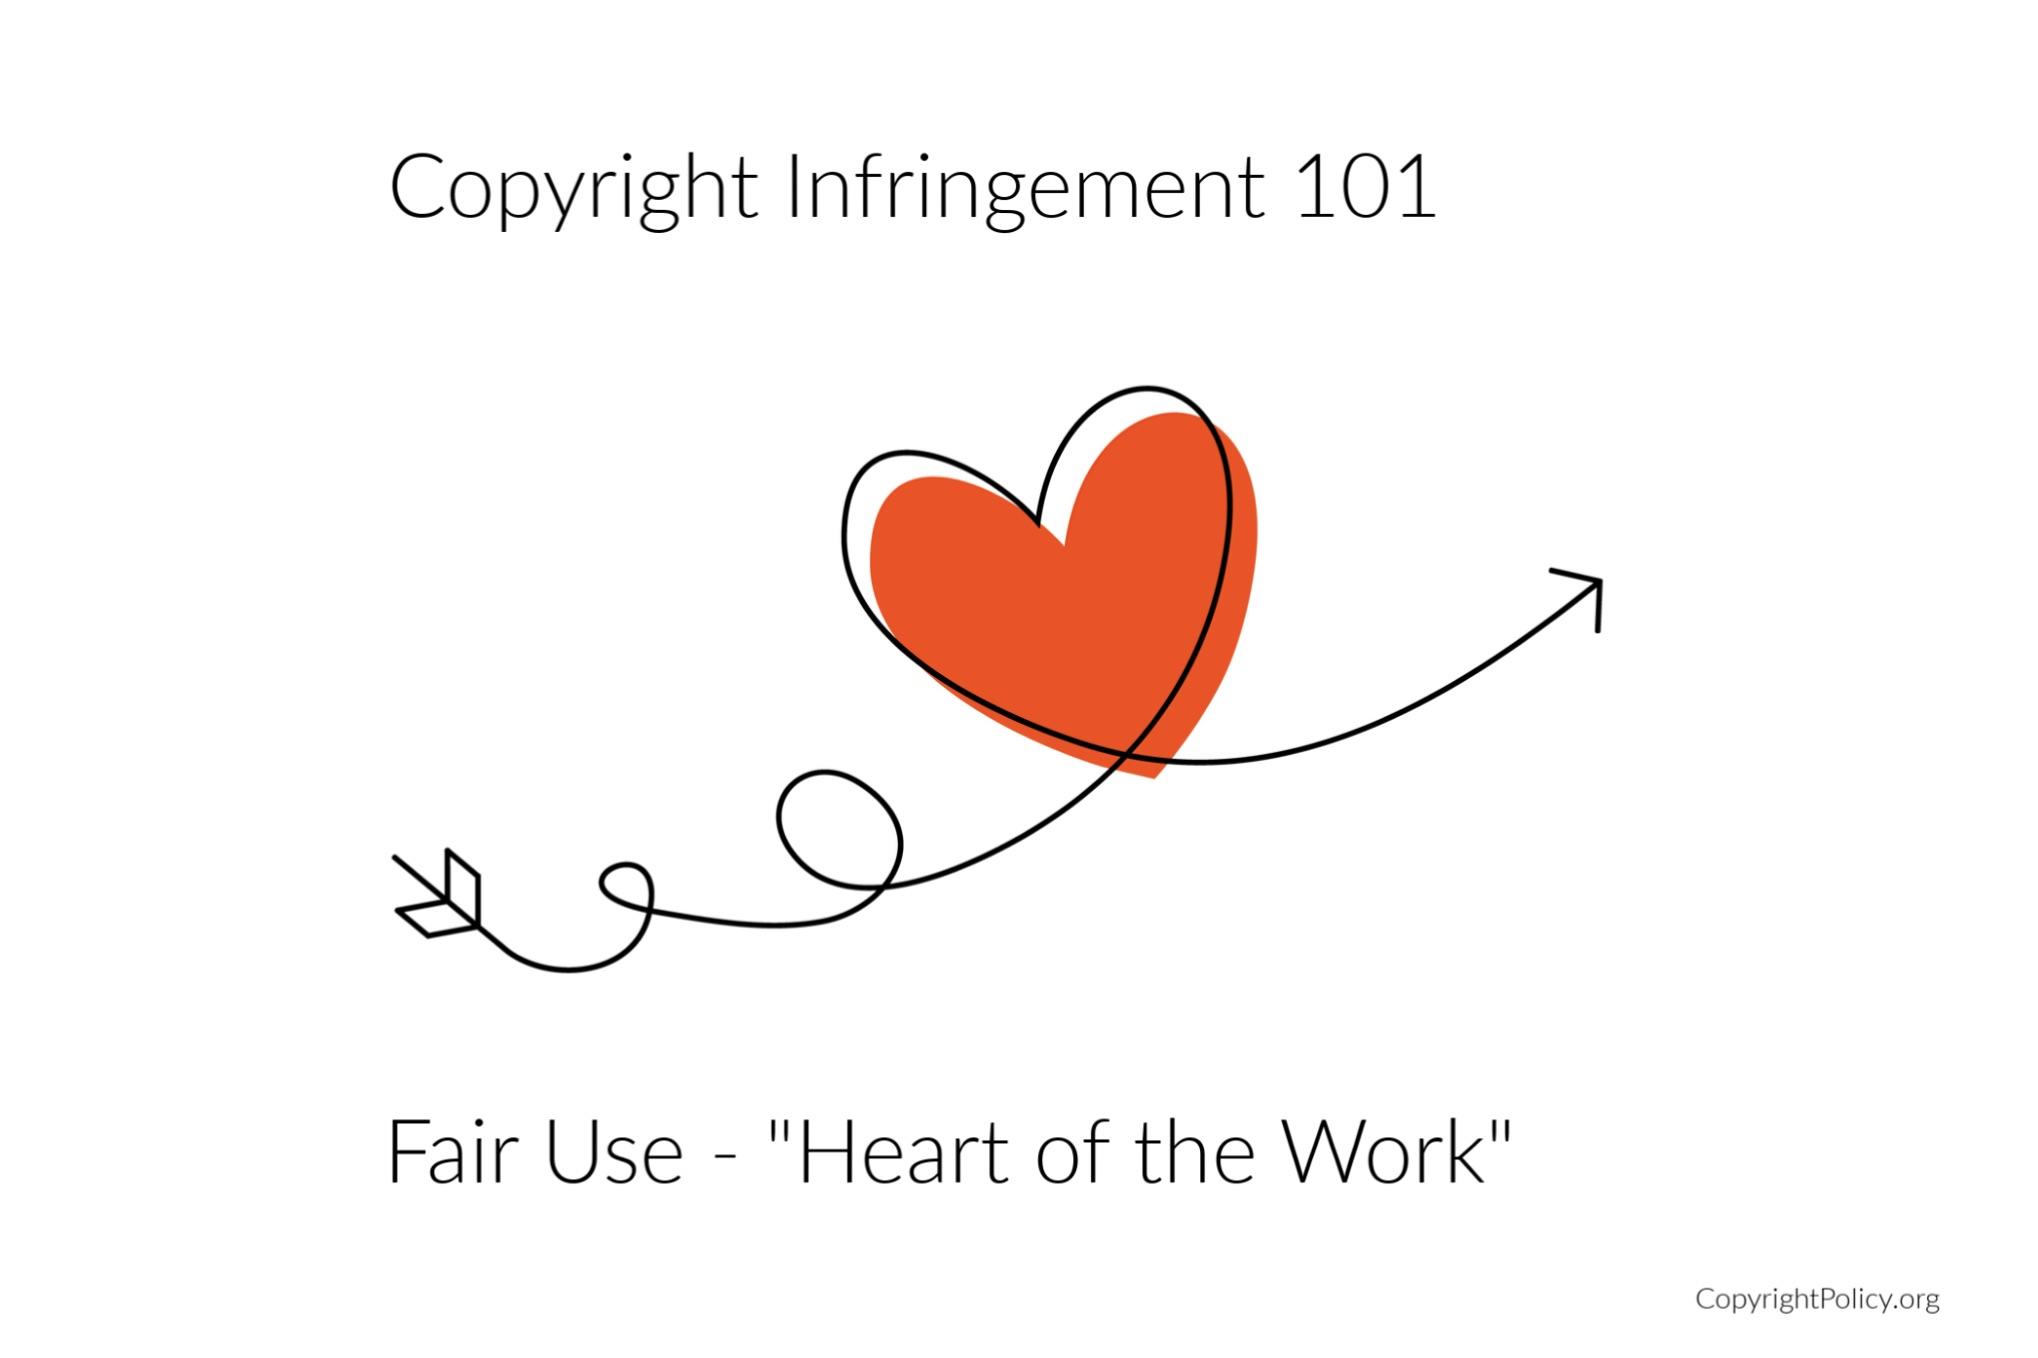 Copyright infringement heart of the work